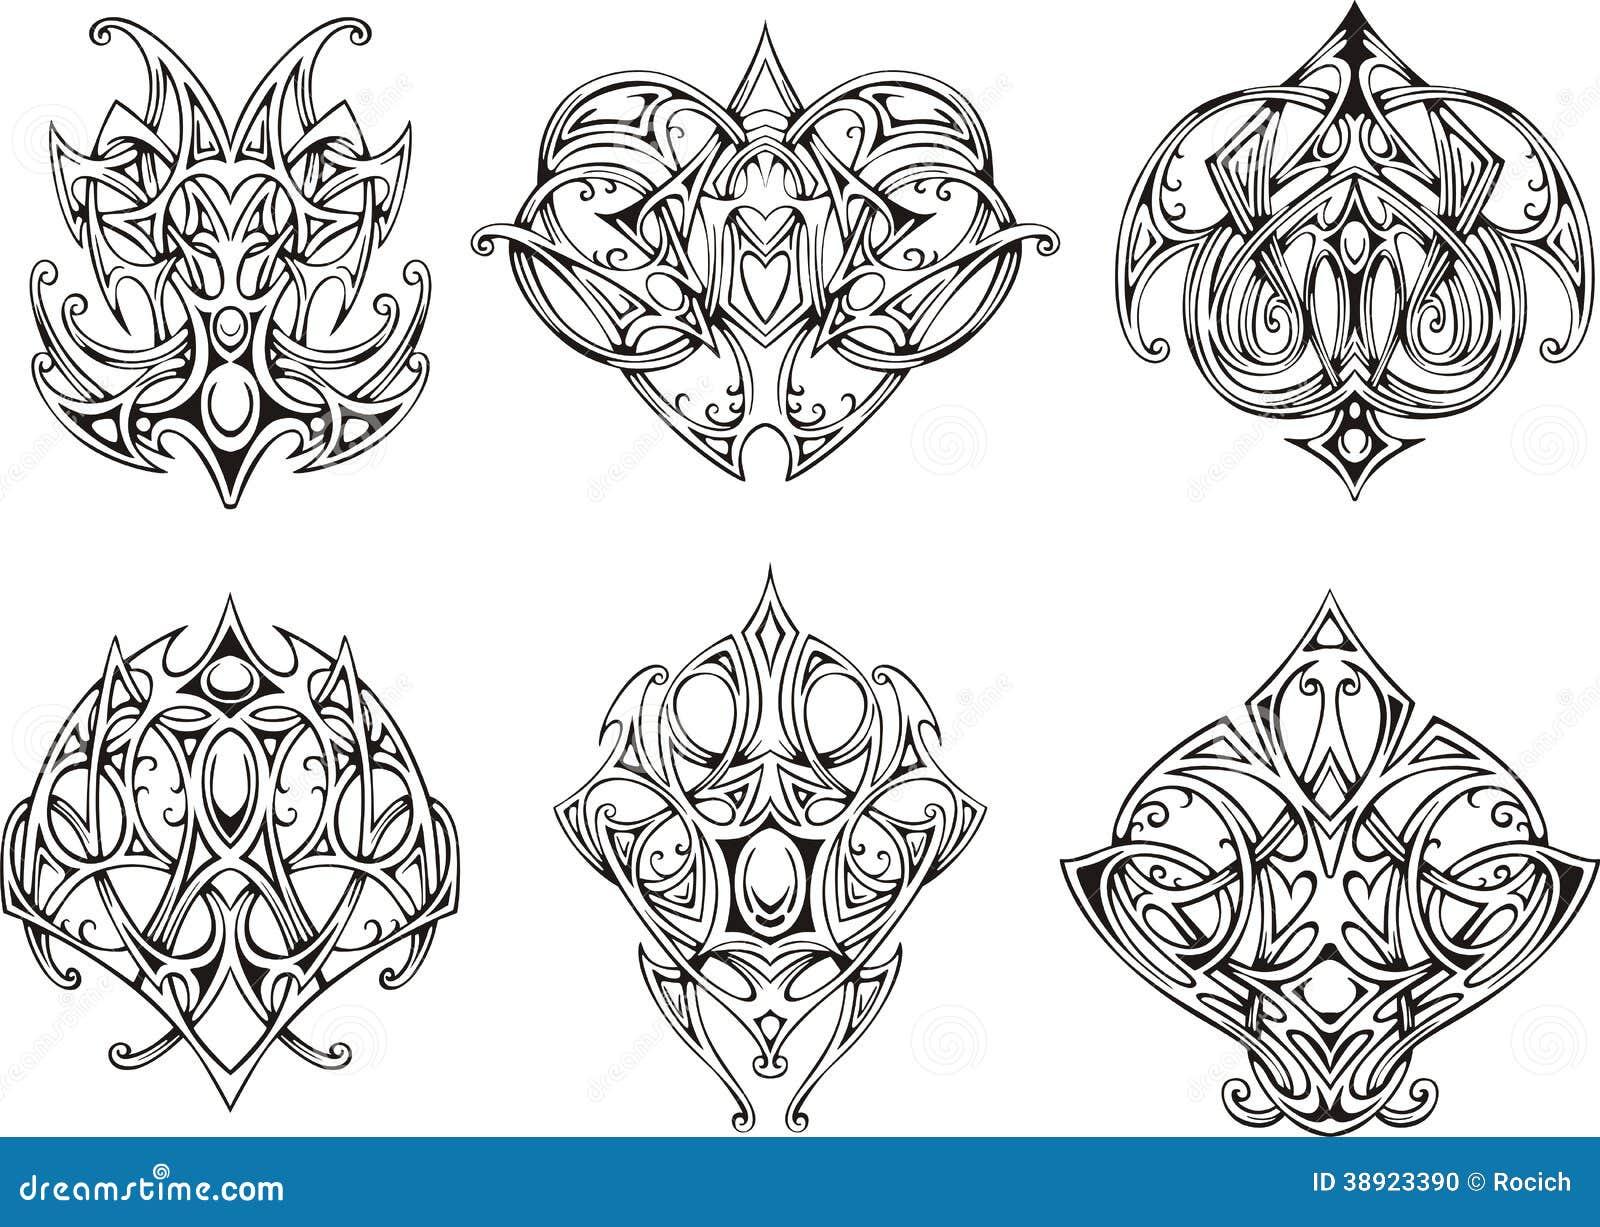 symmetrical knot tattoo designs stock illustration image 38923390. Black Bedroom Furniture Sets. Home Design Ideas